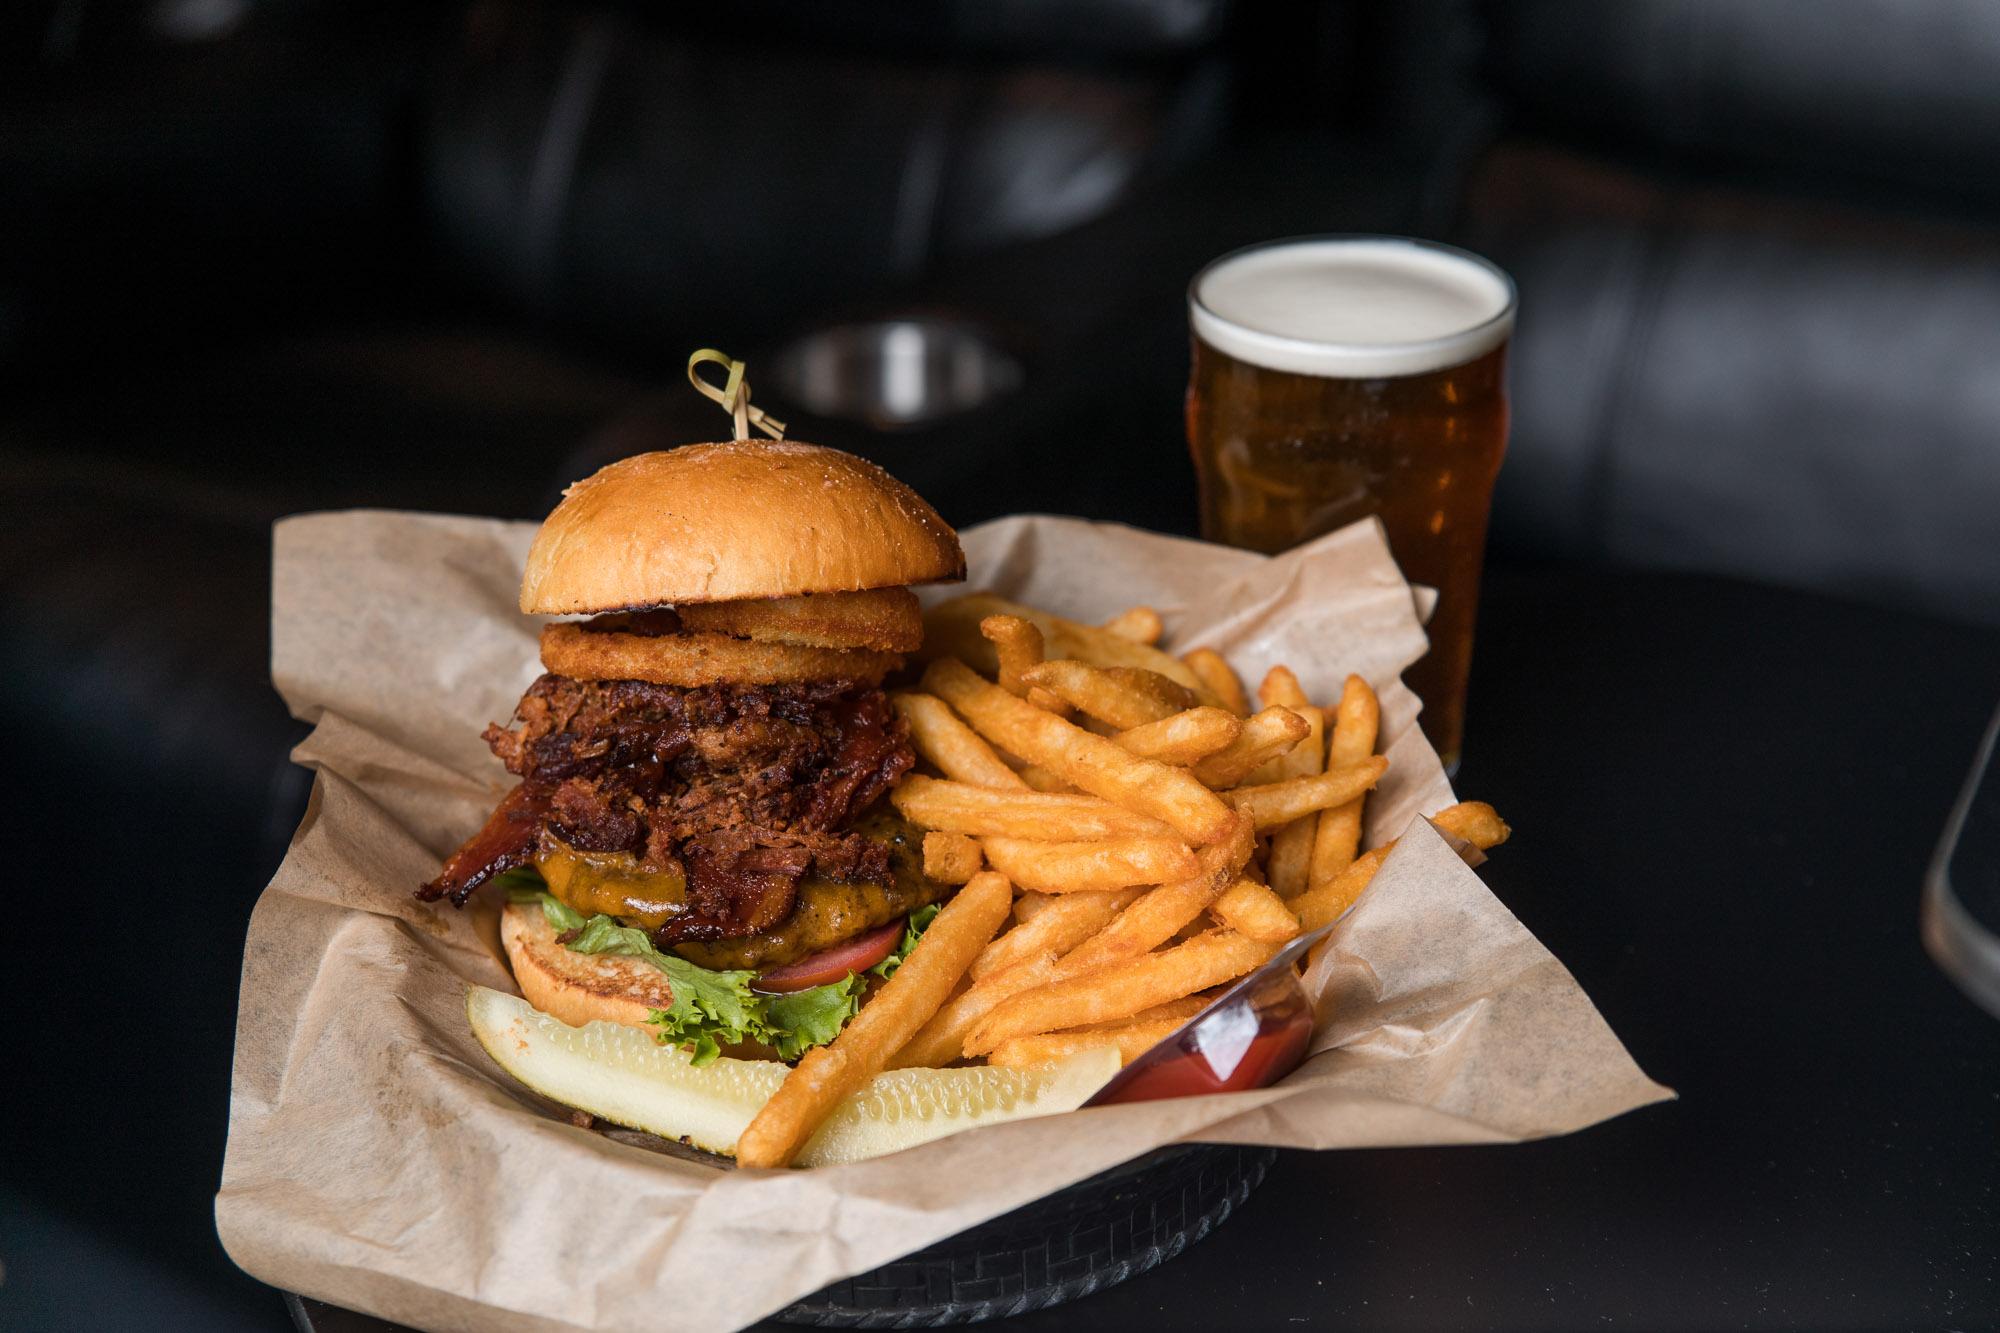 Flix Brewhouse Duke Burger, flex brewhouse, austin photography, austin food photography, austin food photographer, studio k10